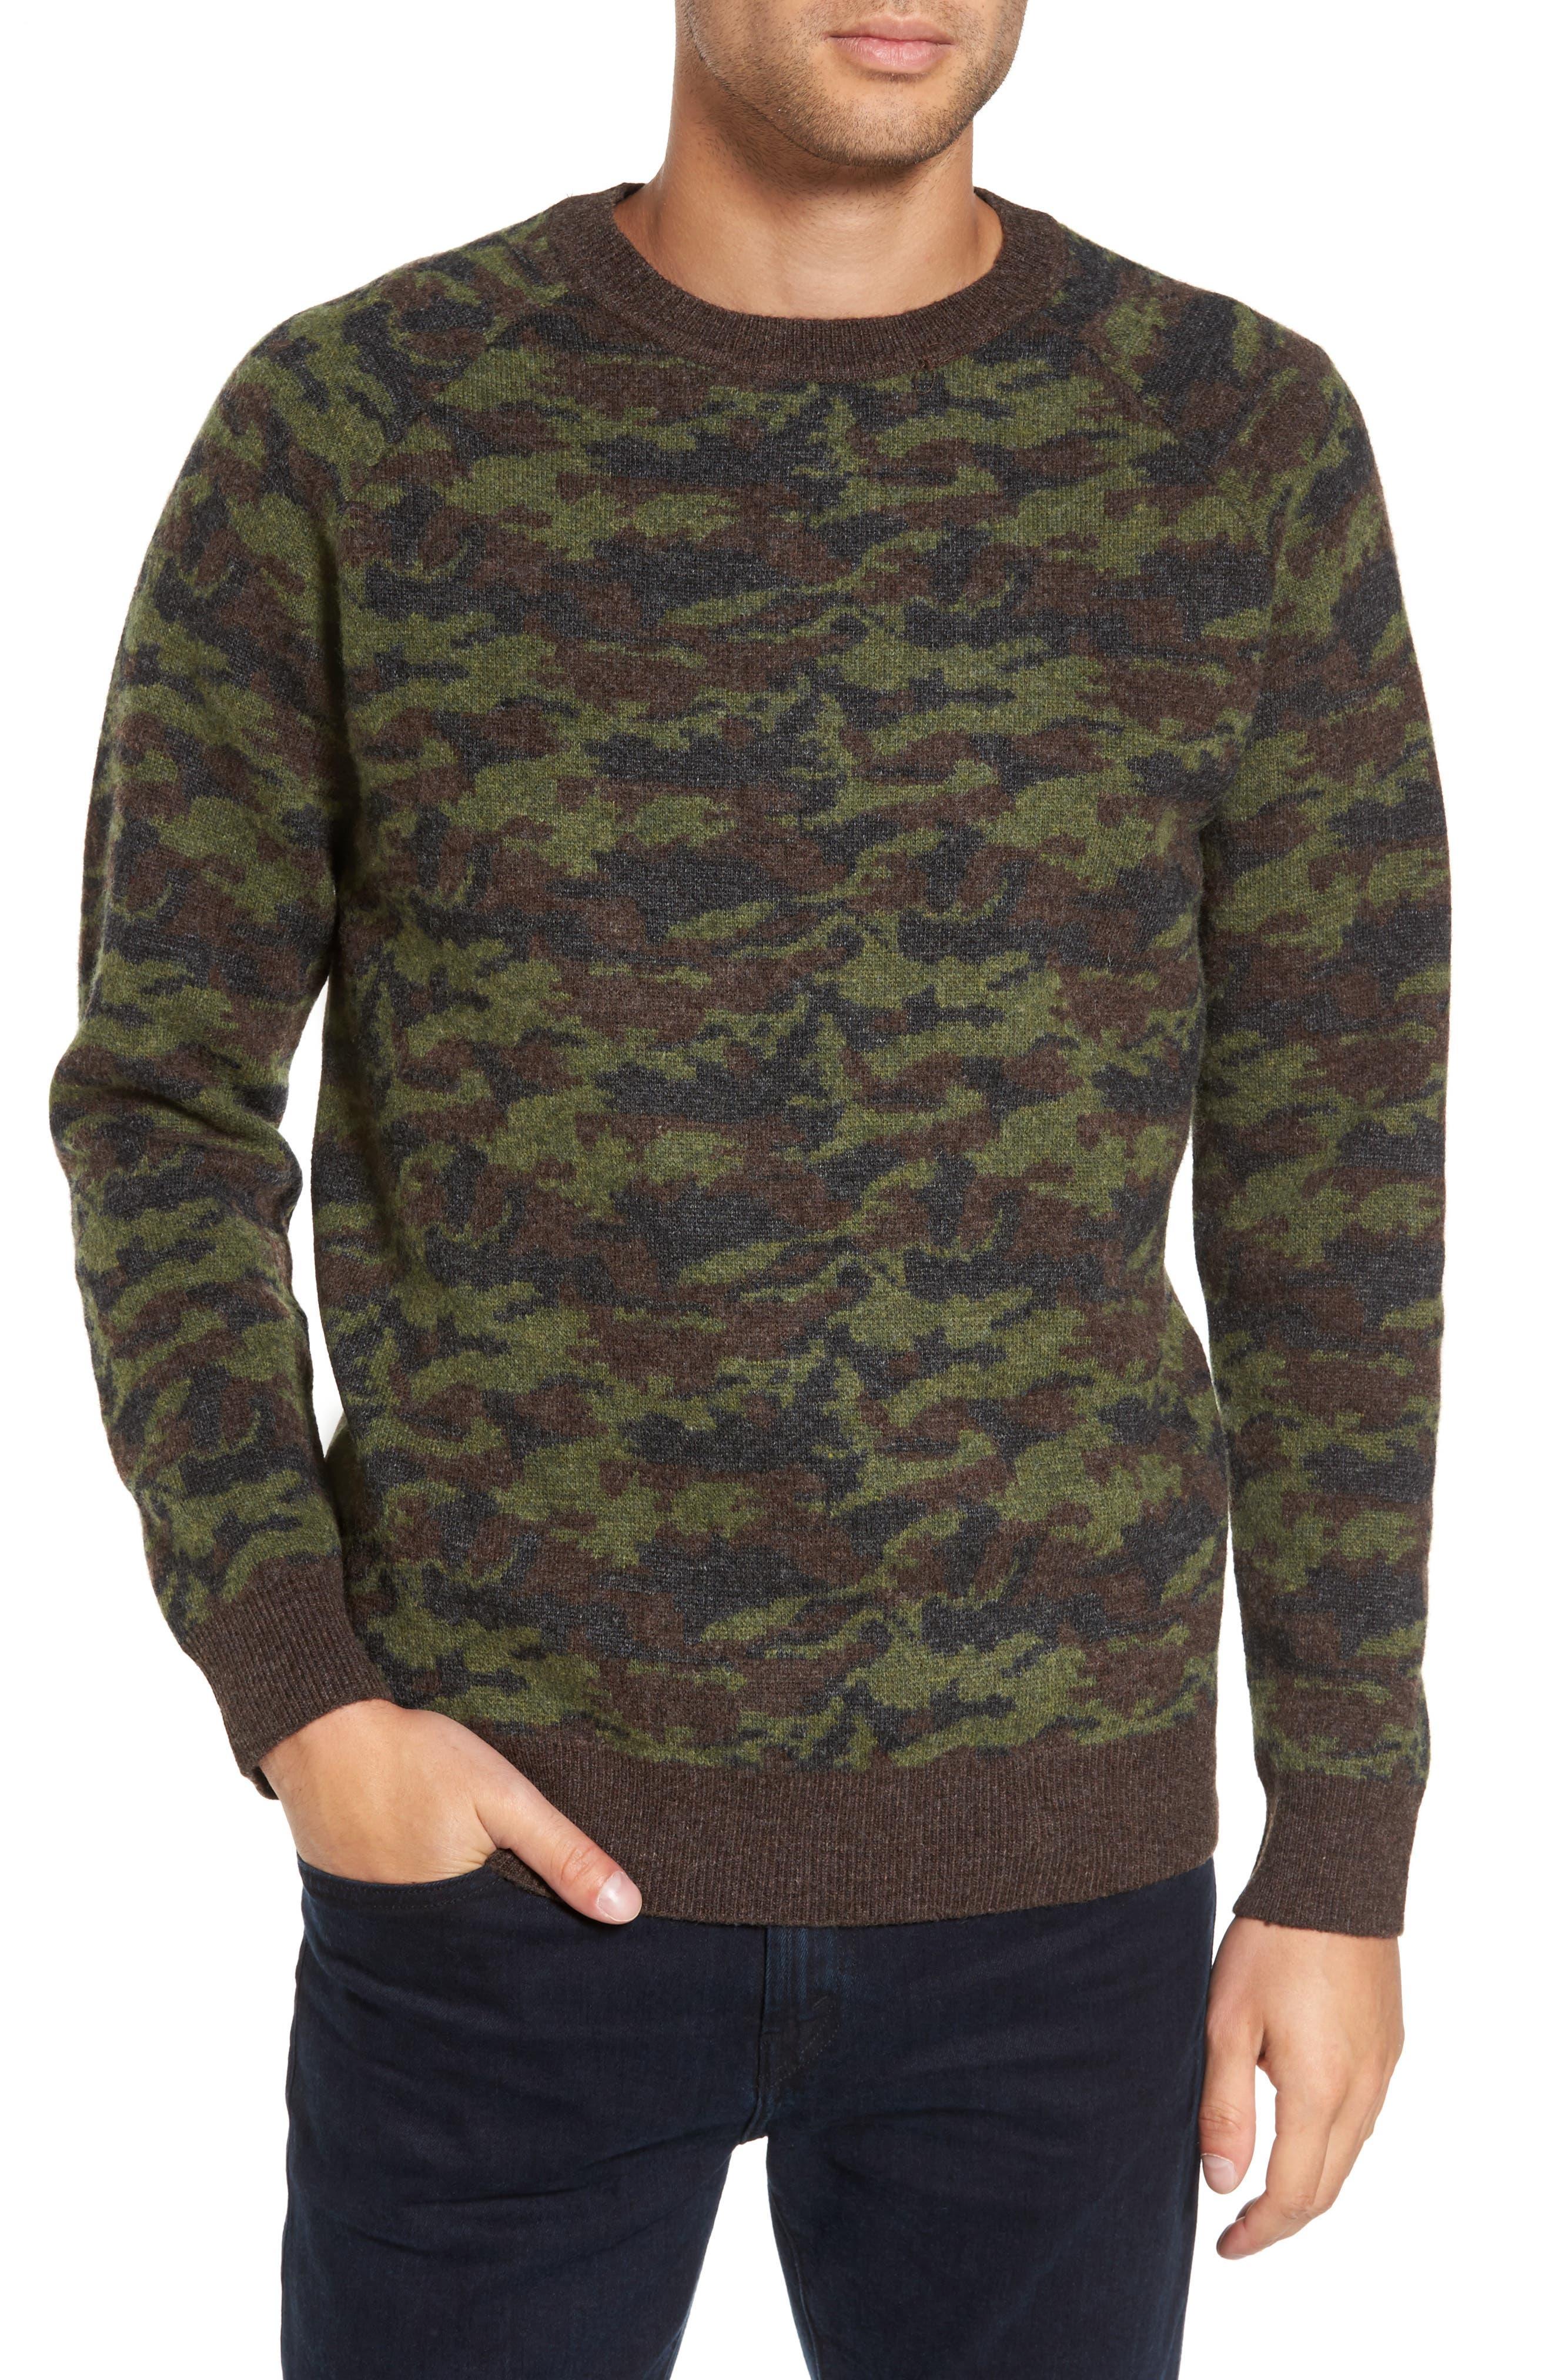 Main Image - Slate & Stone Wool Camo Sweater